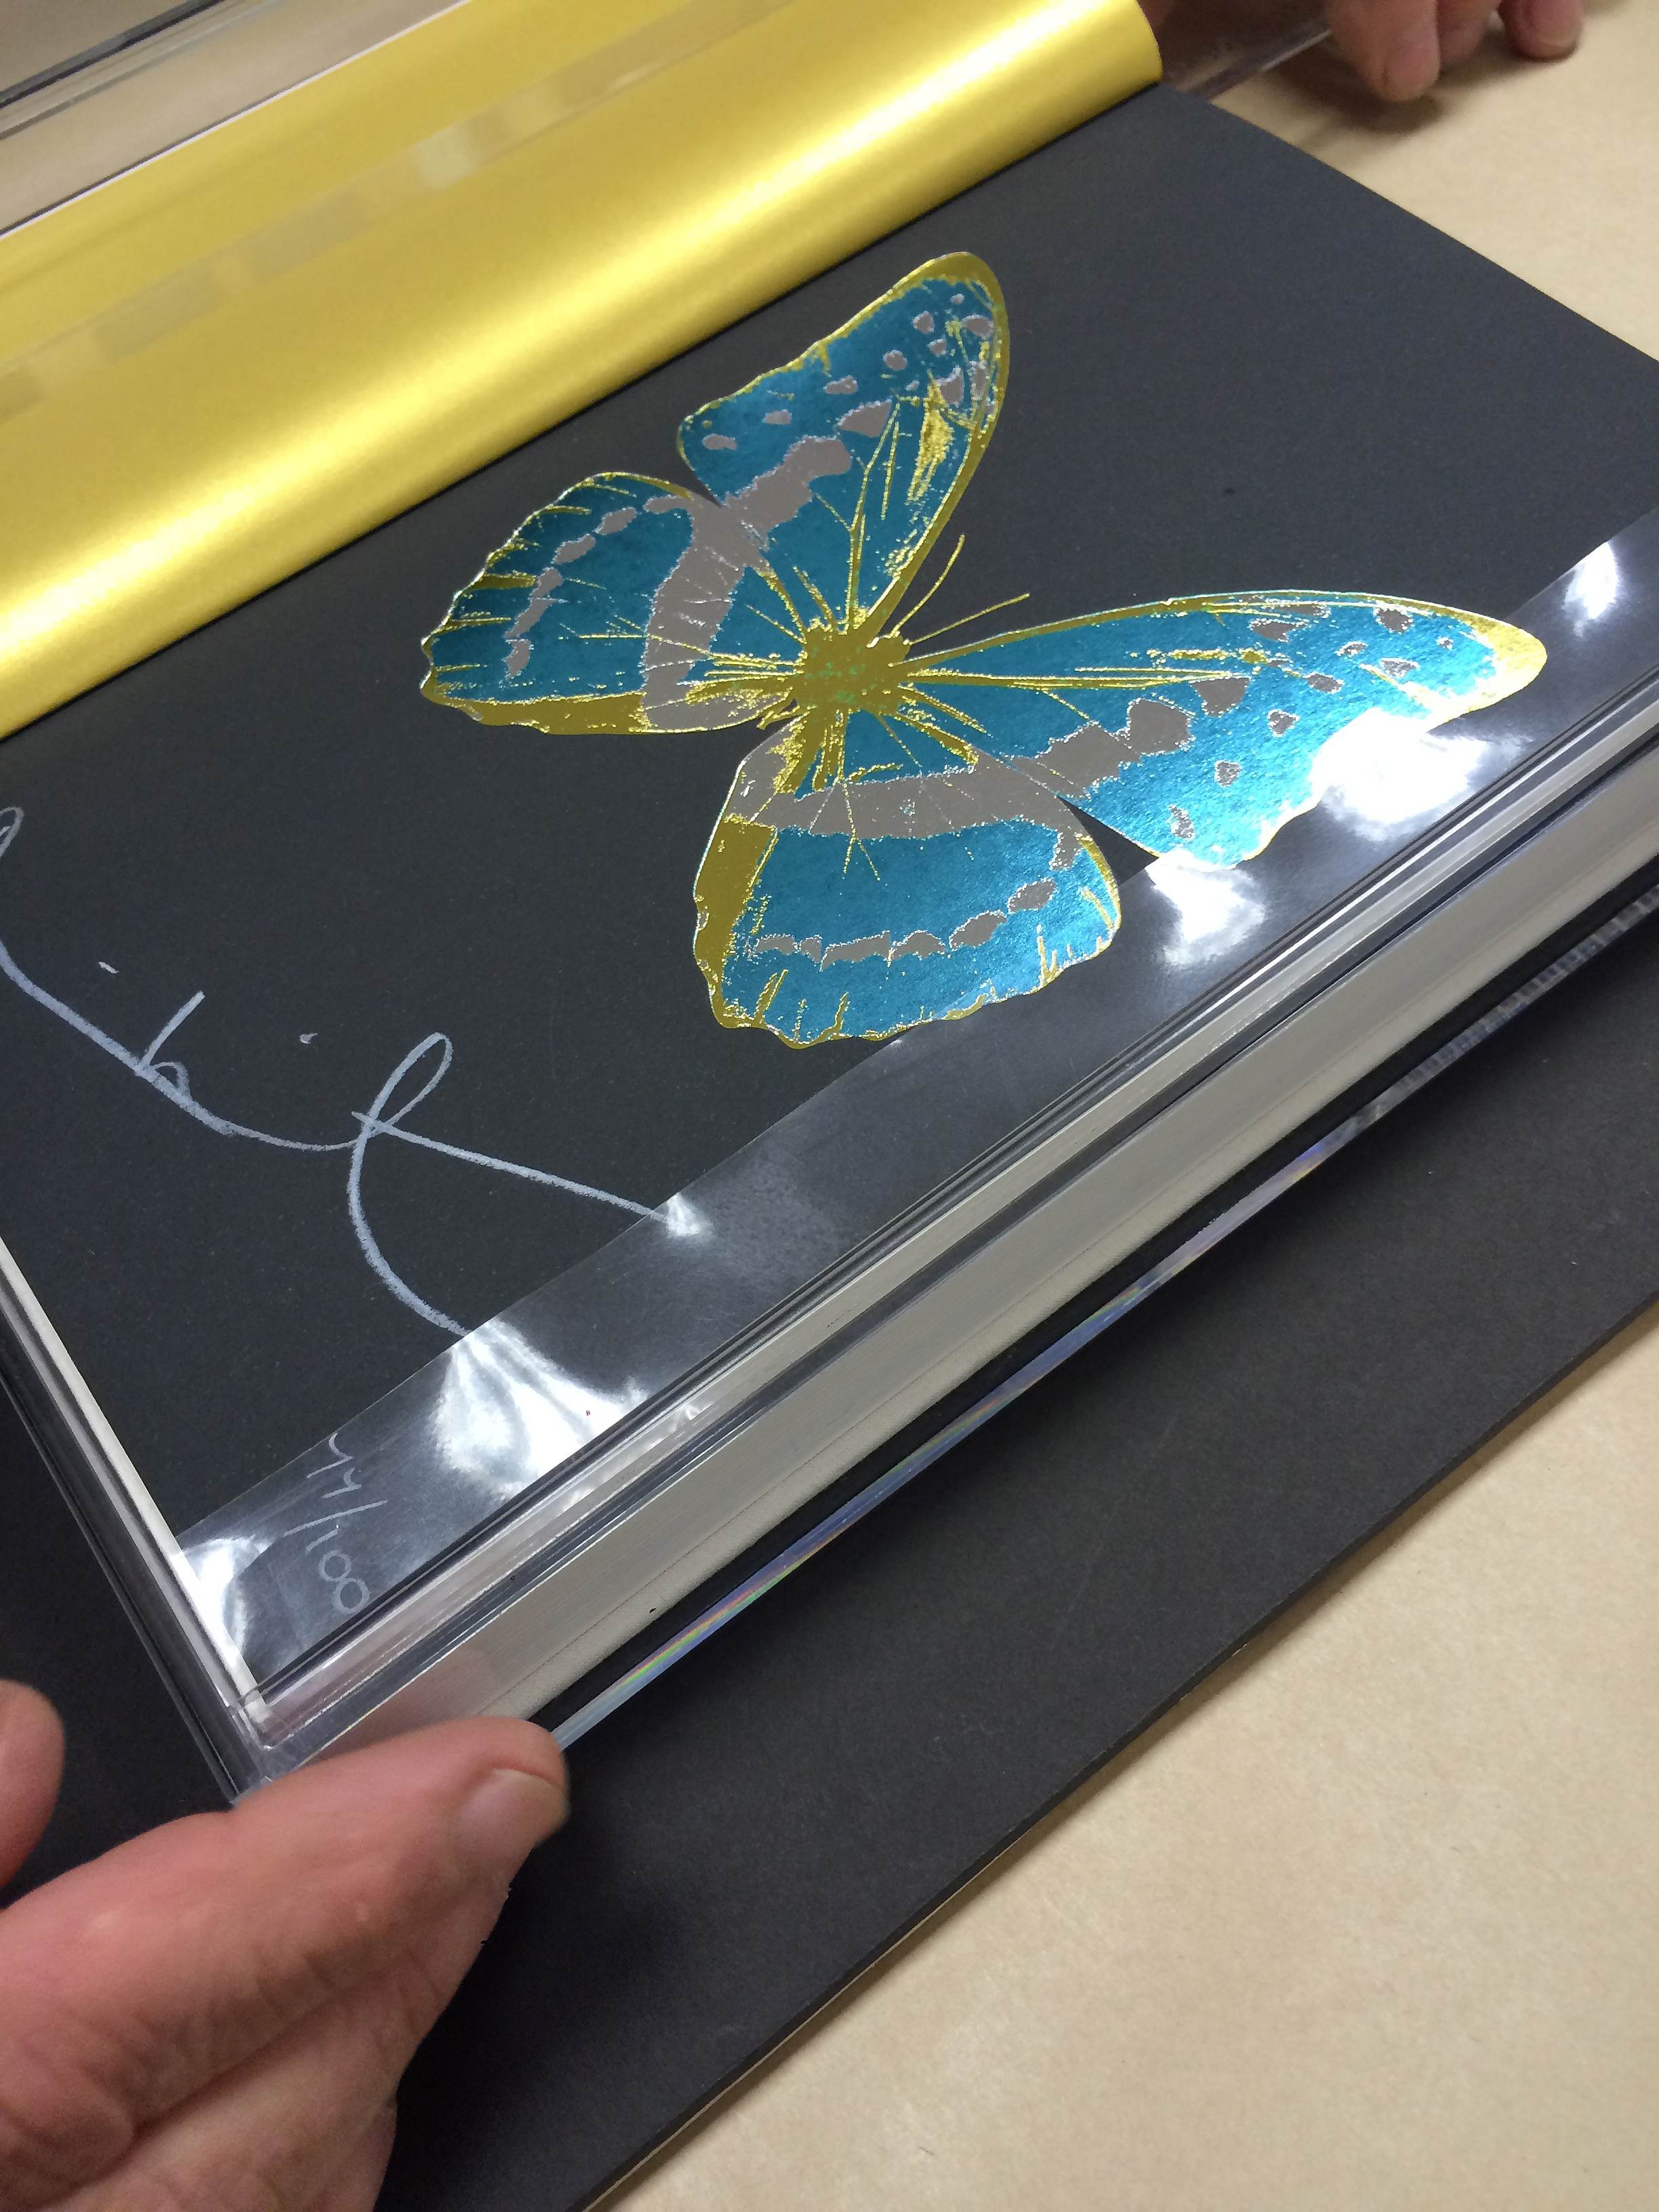 Framed limited edition, Damien Hirst signed artist's book.